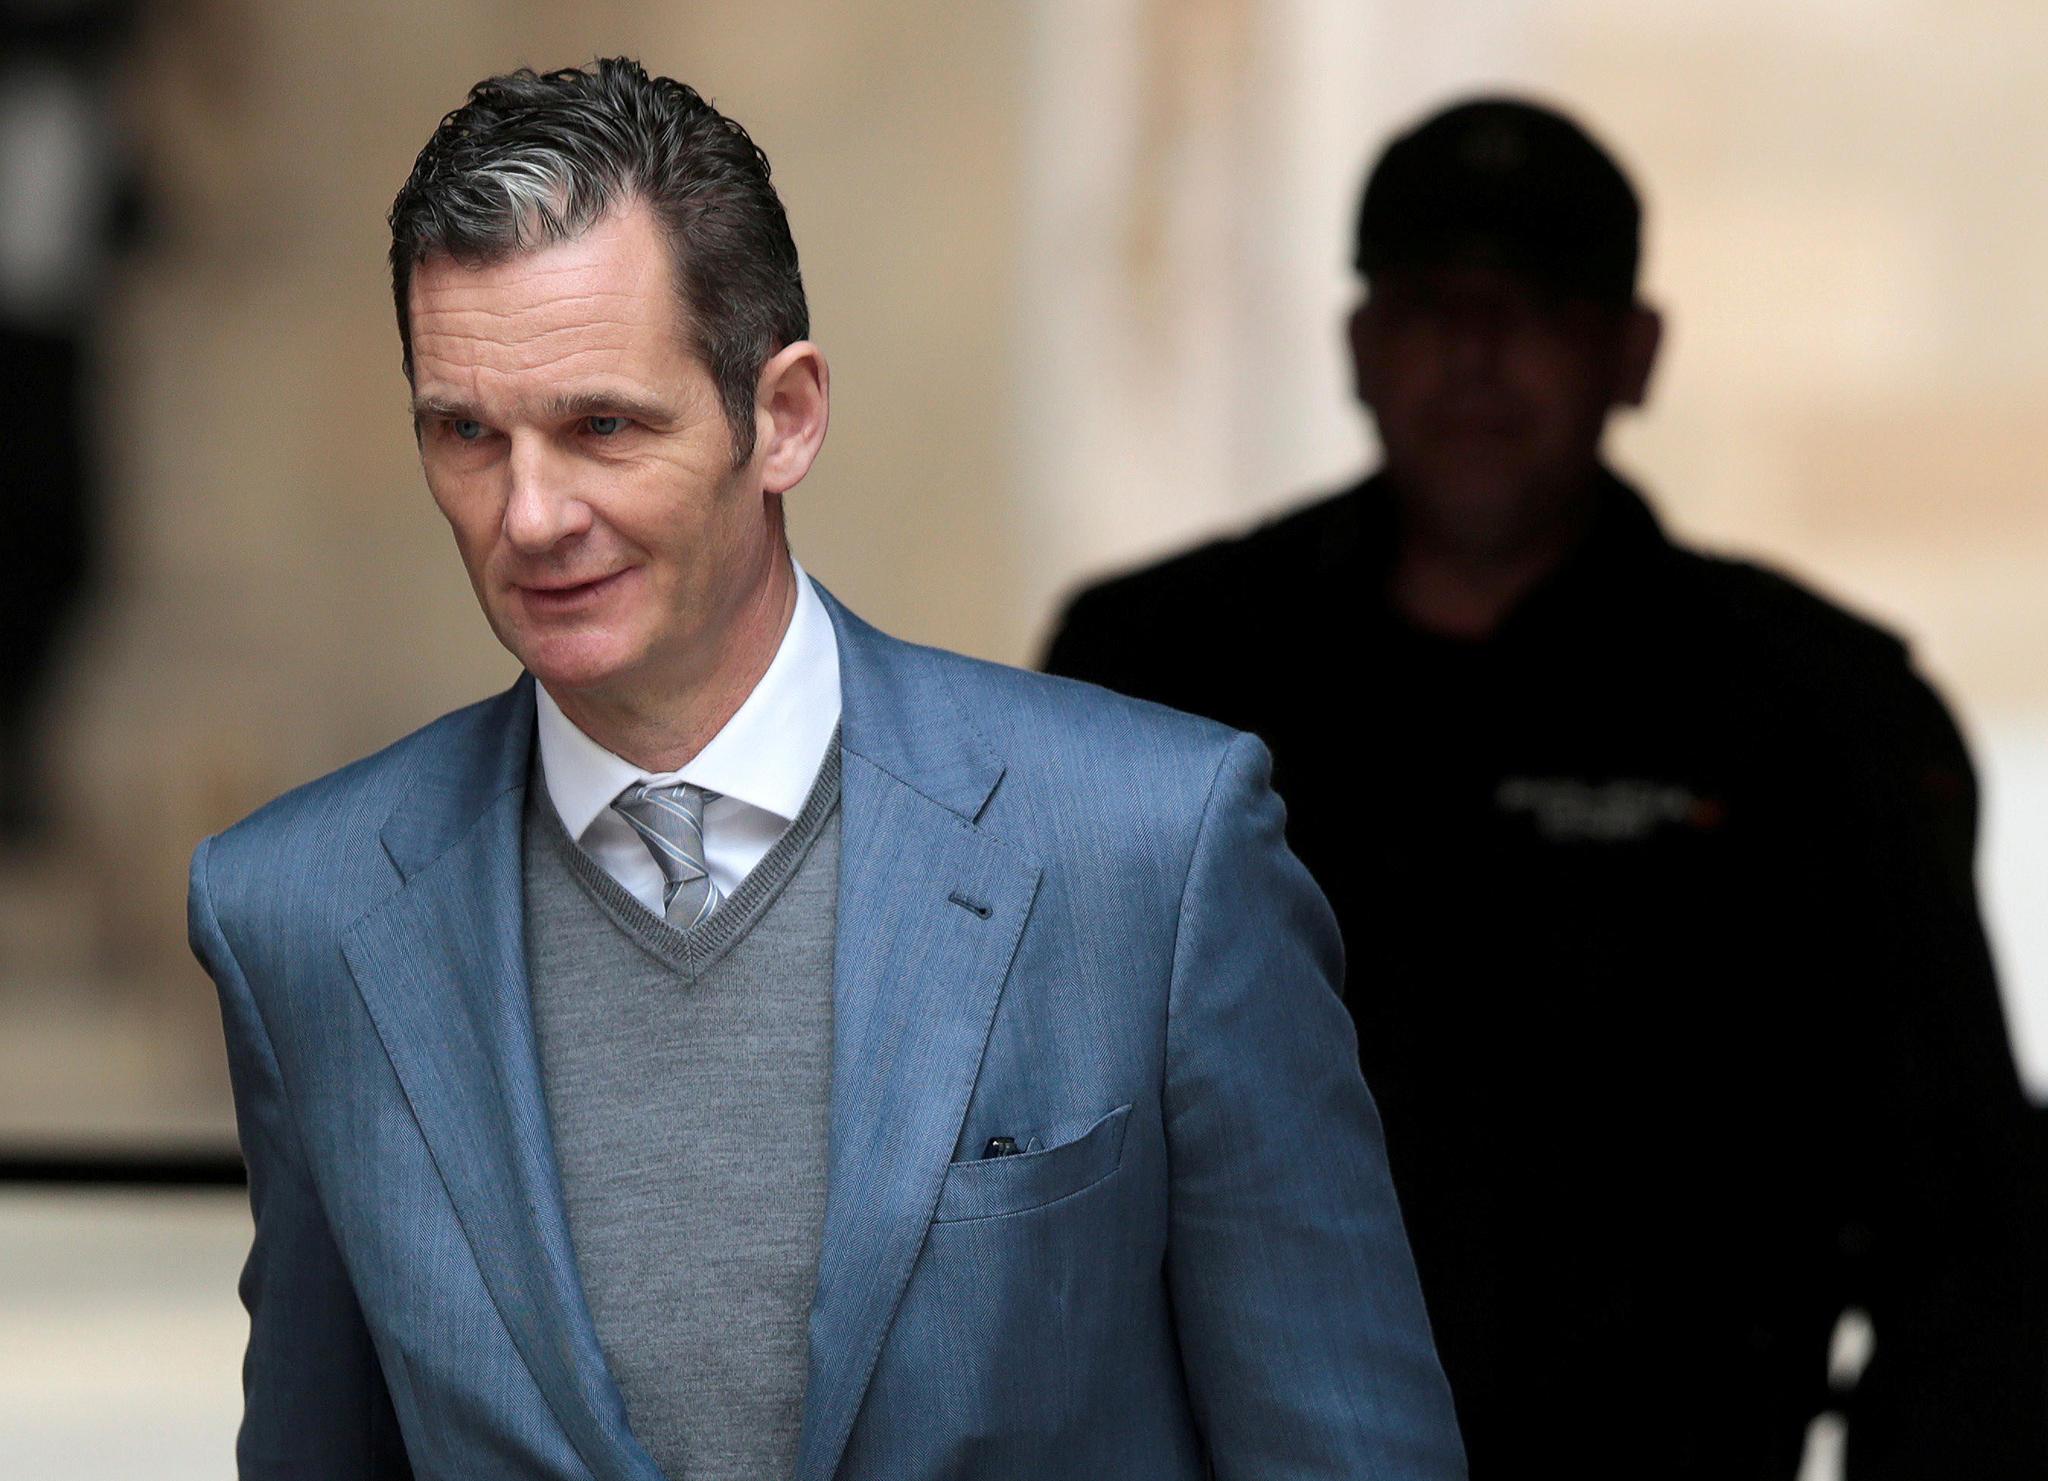 Inaki Urdangarin, husband of Spain's Princess Cristina, leaves court after a hearing in Palma de Mallorca